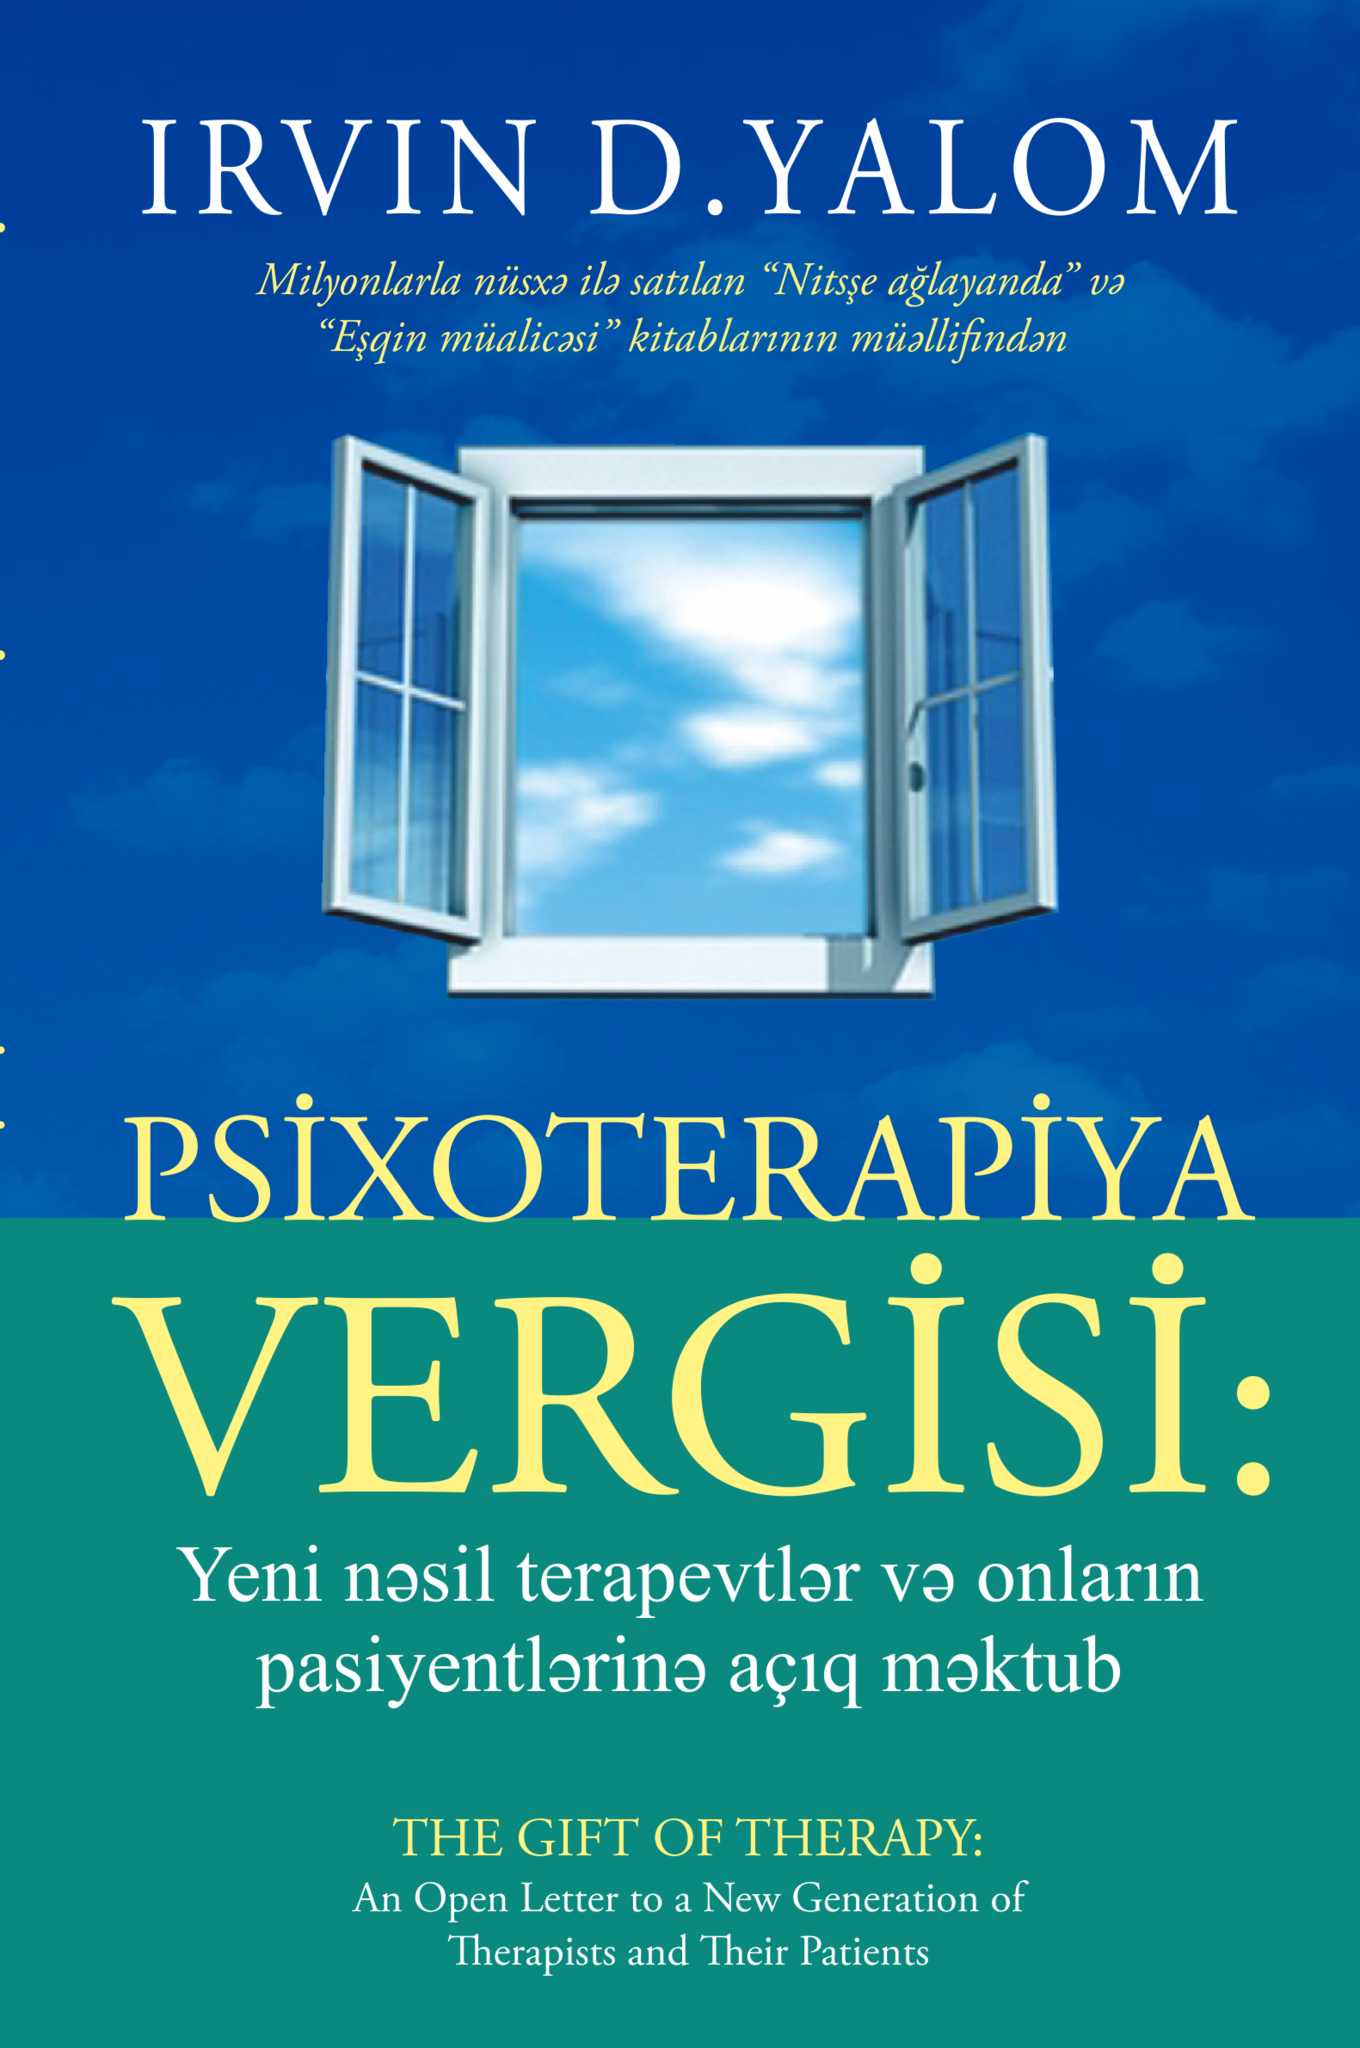 Kitab Psixoterapiya vergisi | Irvin D. Yalom